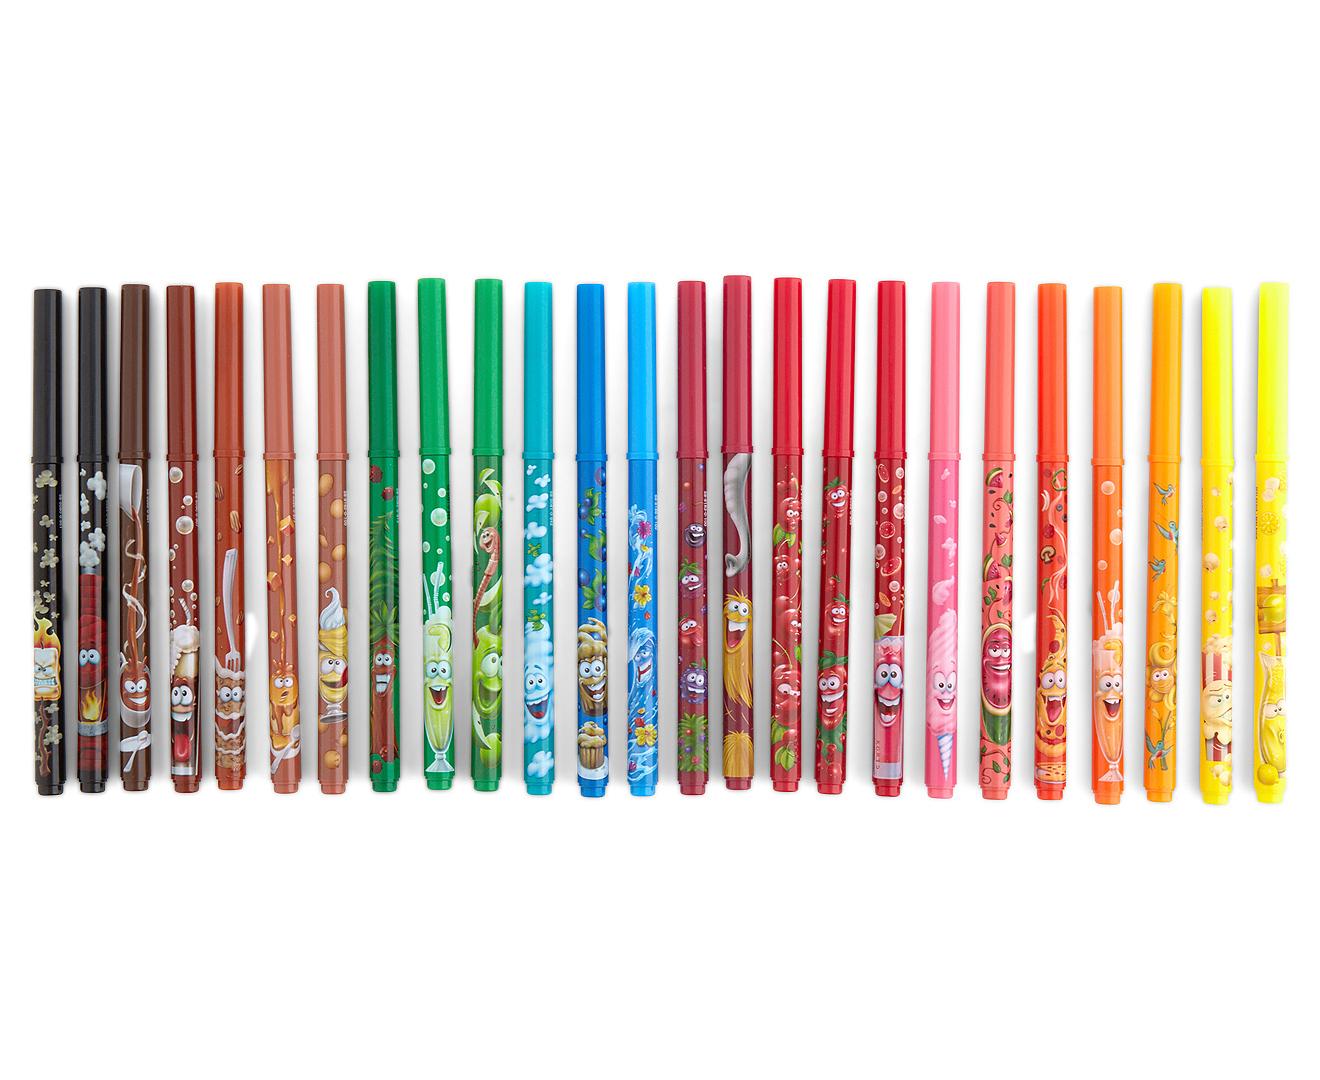 Catchoftheday Com Au Crayola Doodle Scent Markets 25pk